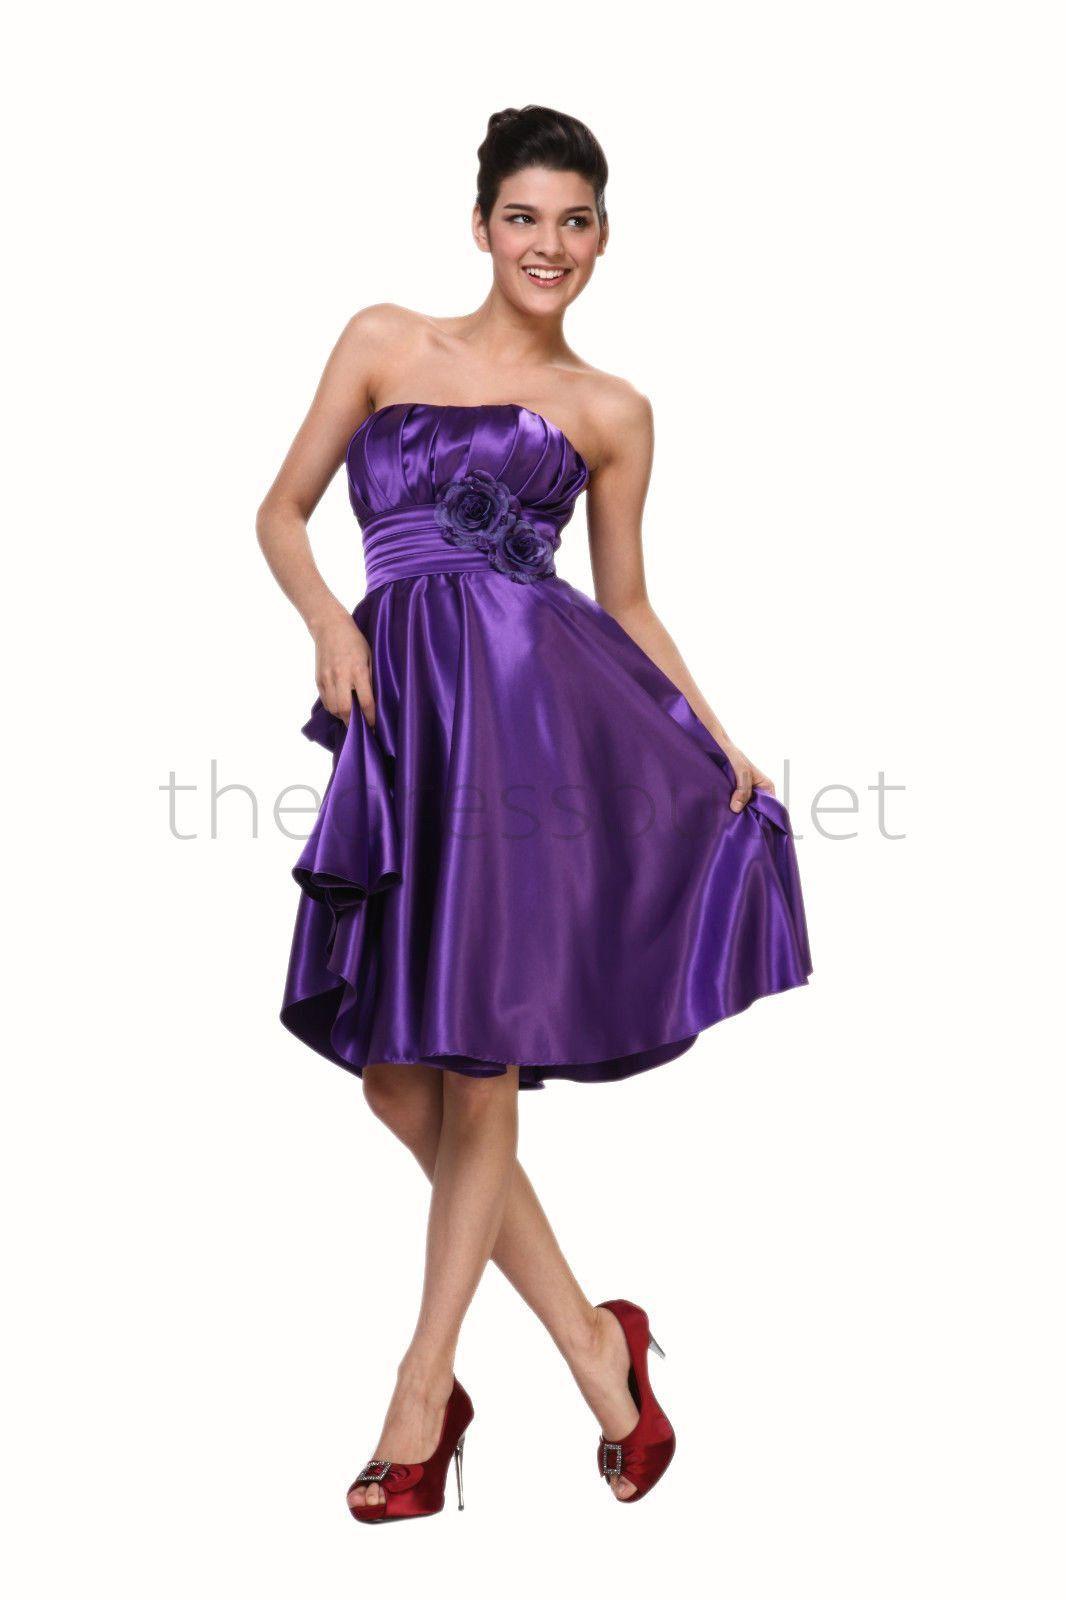 Formal Short Prom Bridesmaids Dresses Plus Size Cocktail | Quick ...